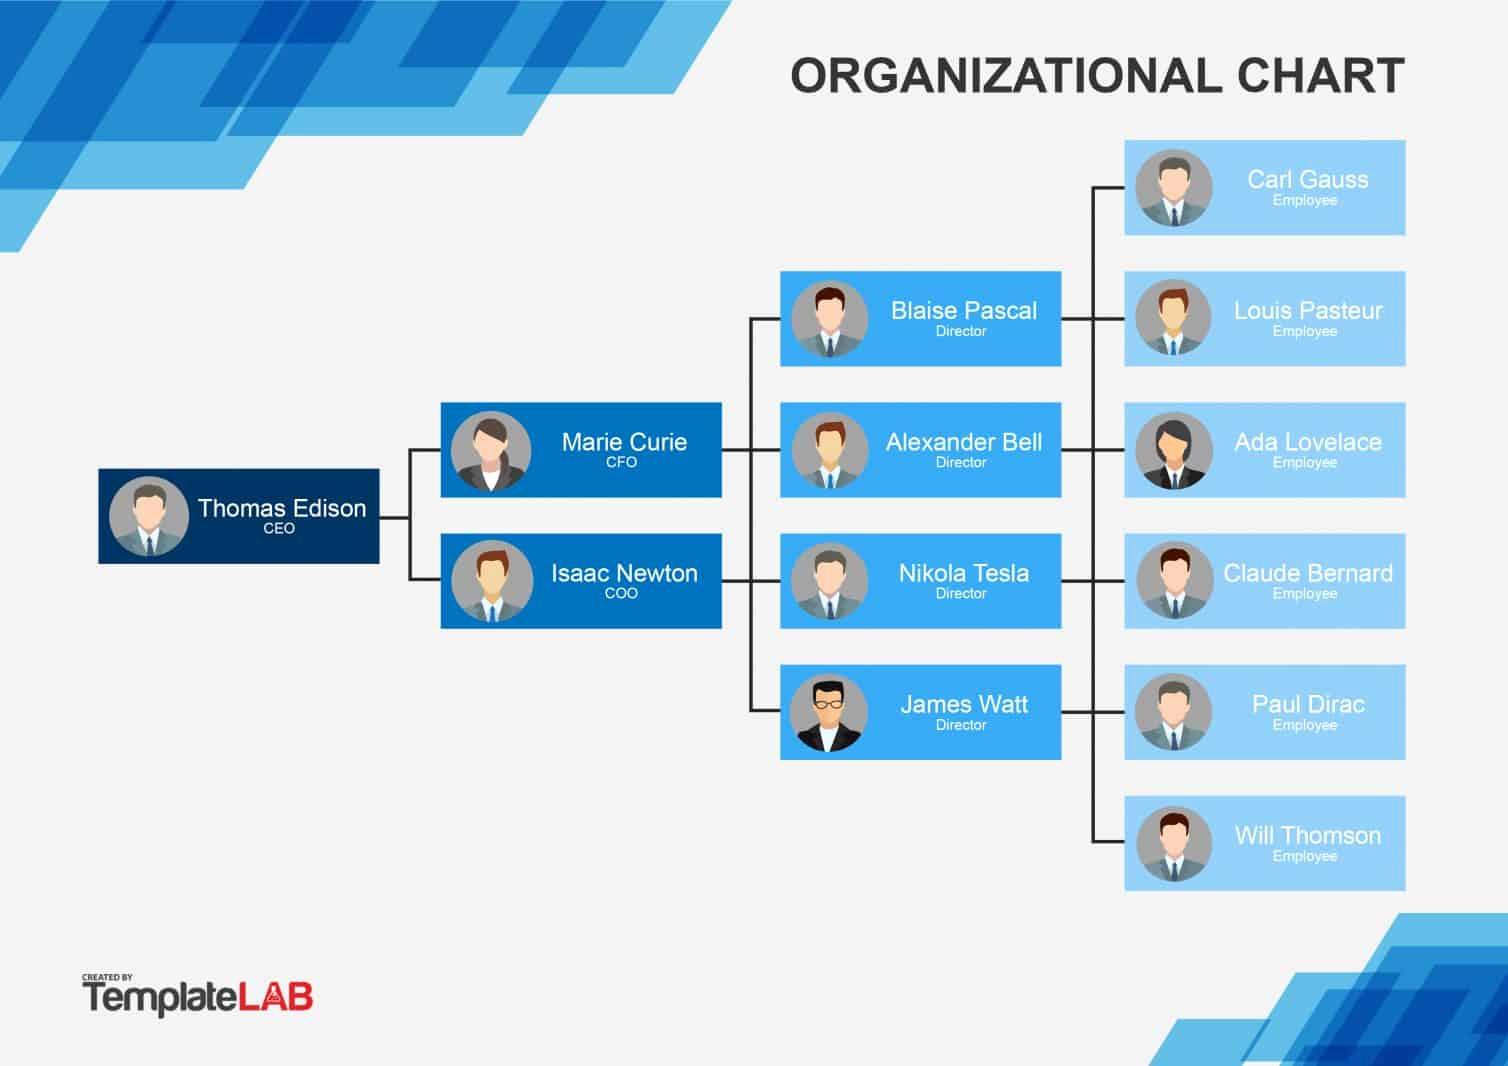 Organizational Chart Template Word Fresh 40 organizational Chart Templates Word Excel Powerpoint